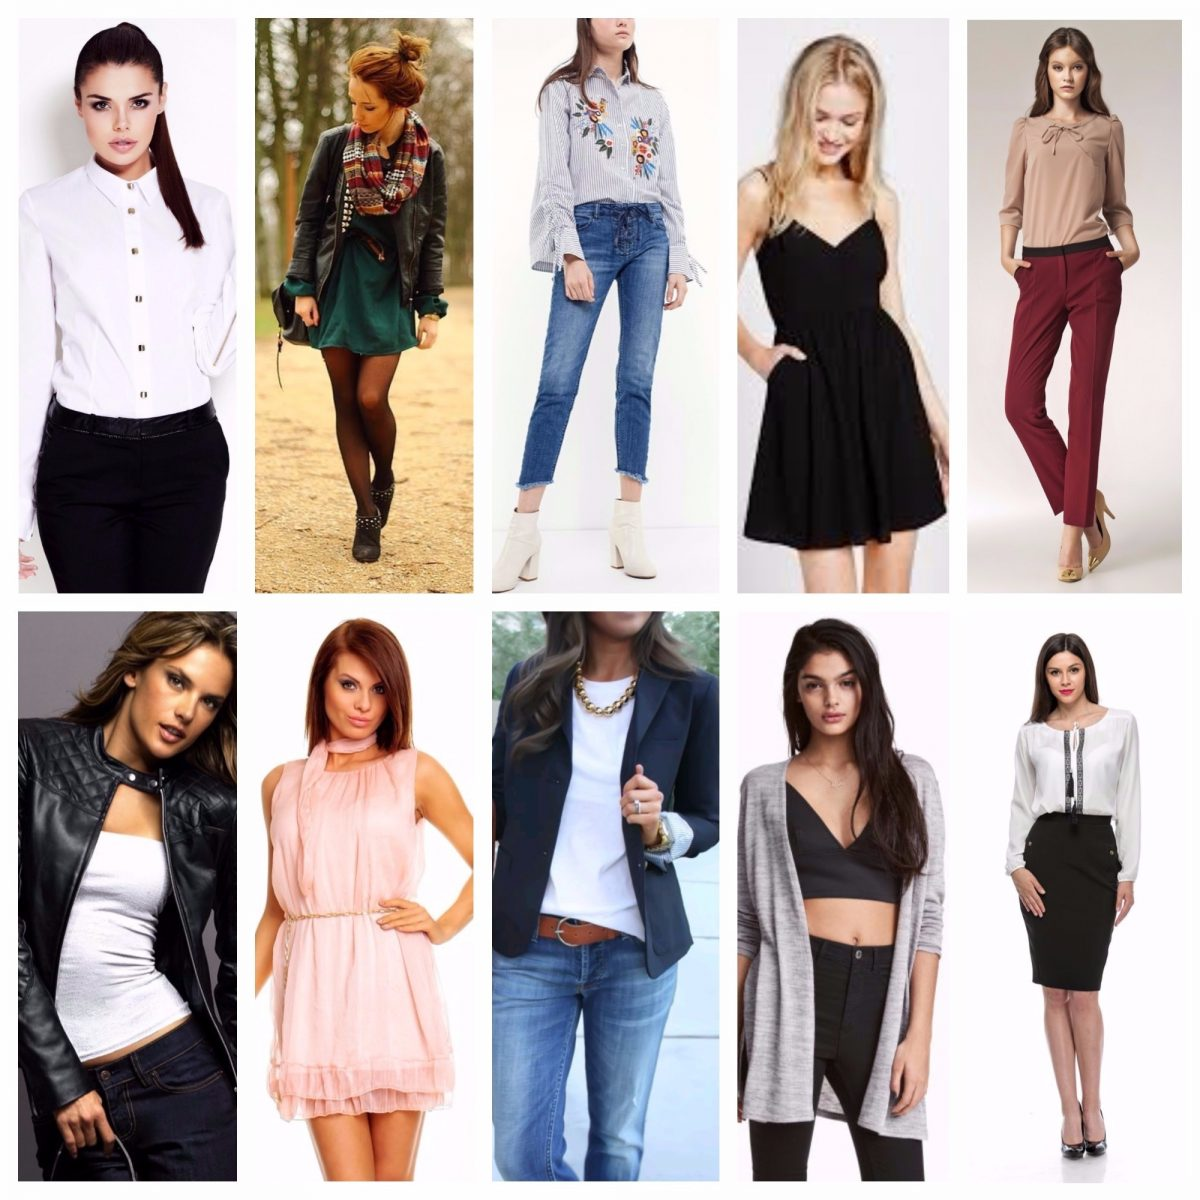 Top 10 piese vestimentare usor de asortat